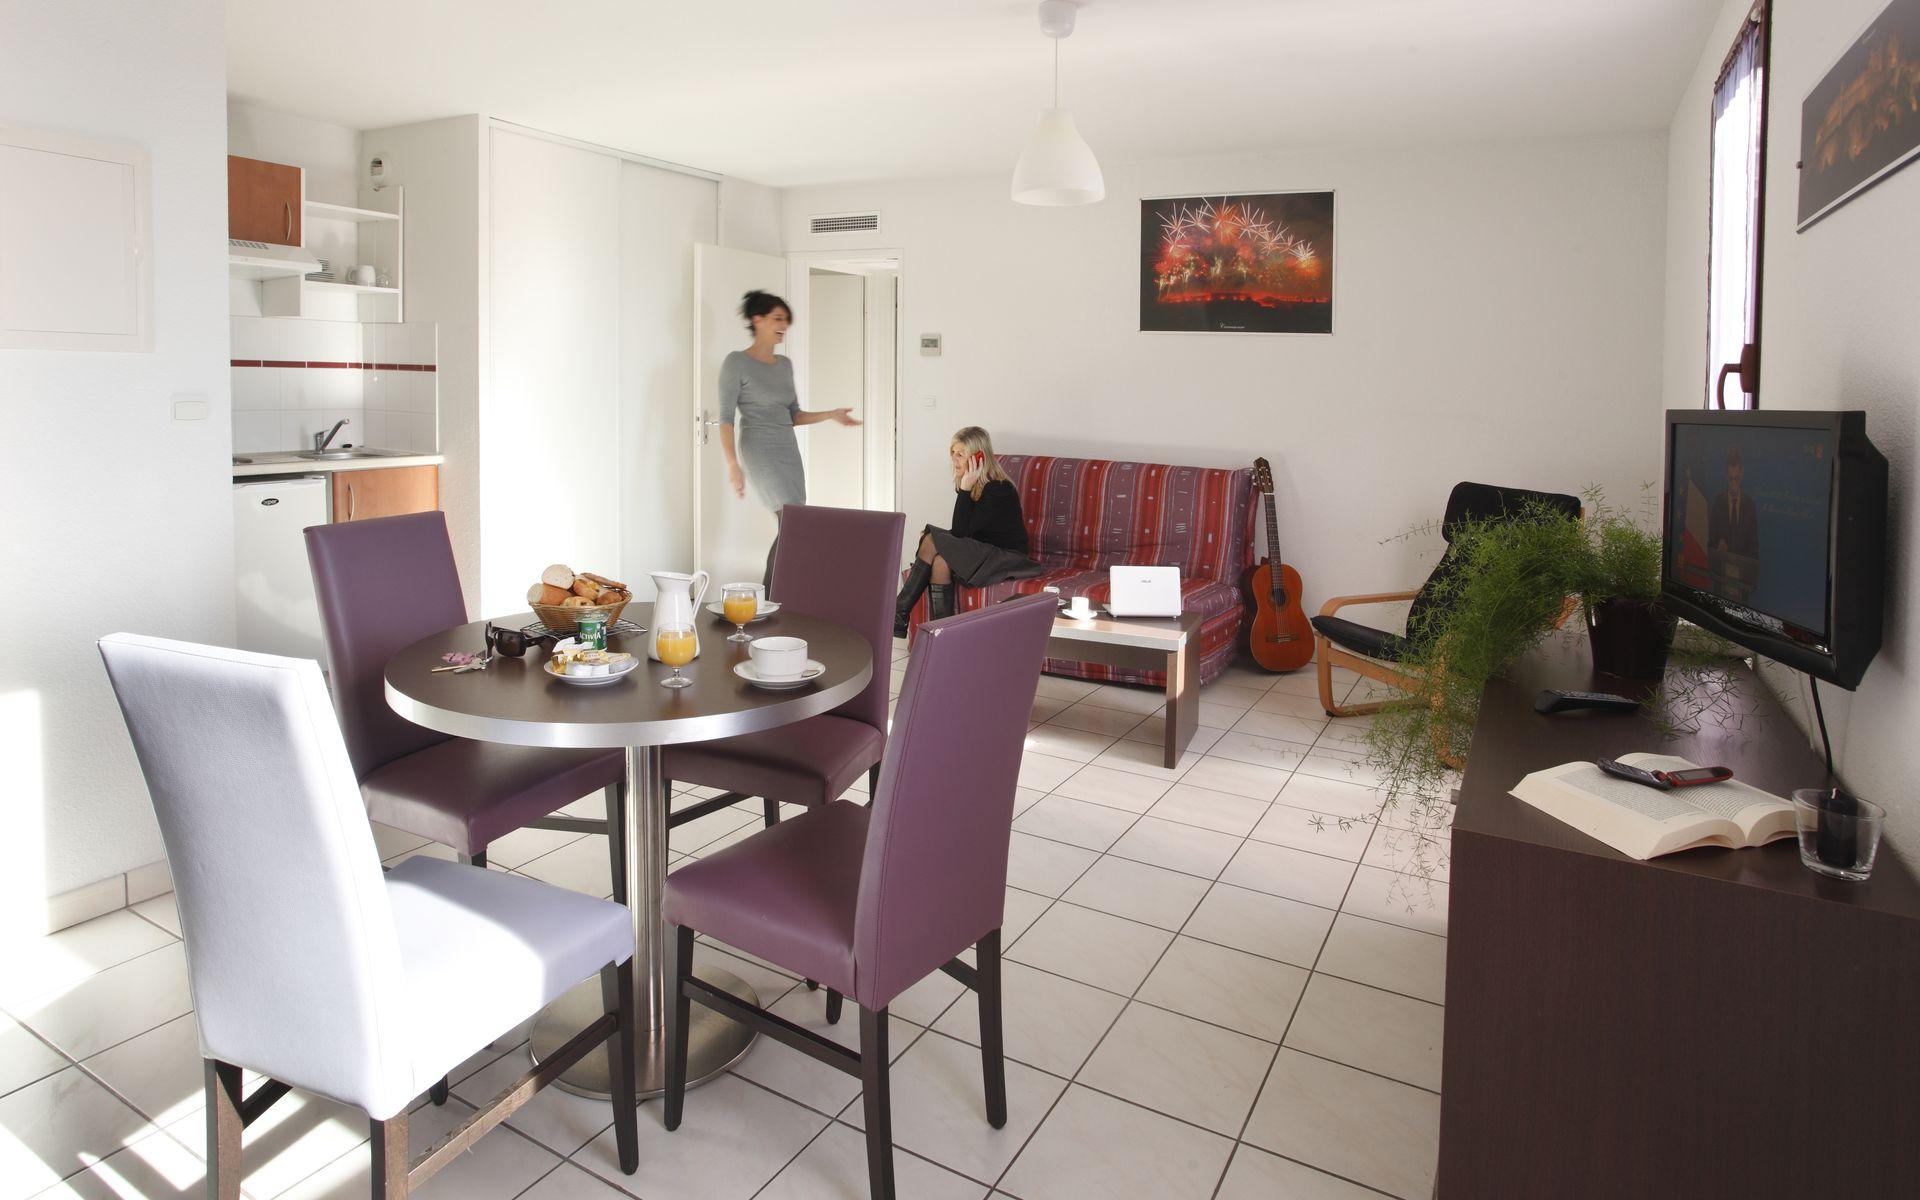 Hotel r sidence adonis la barbacane carcassonne logitravel - Television pequena plana ...